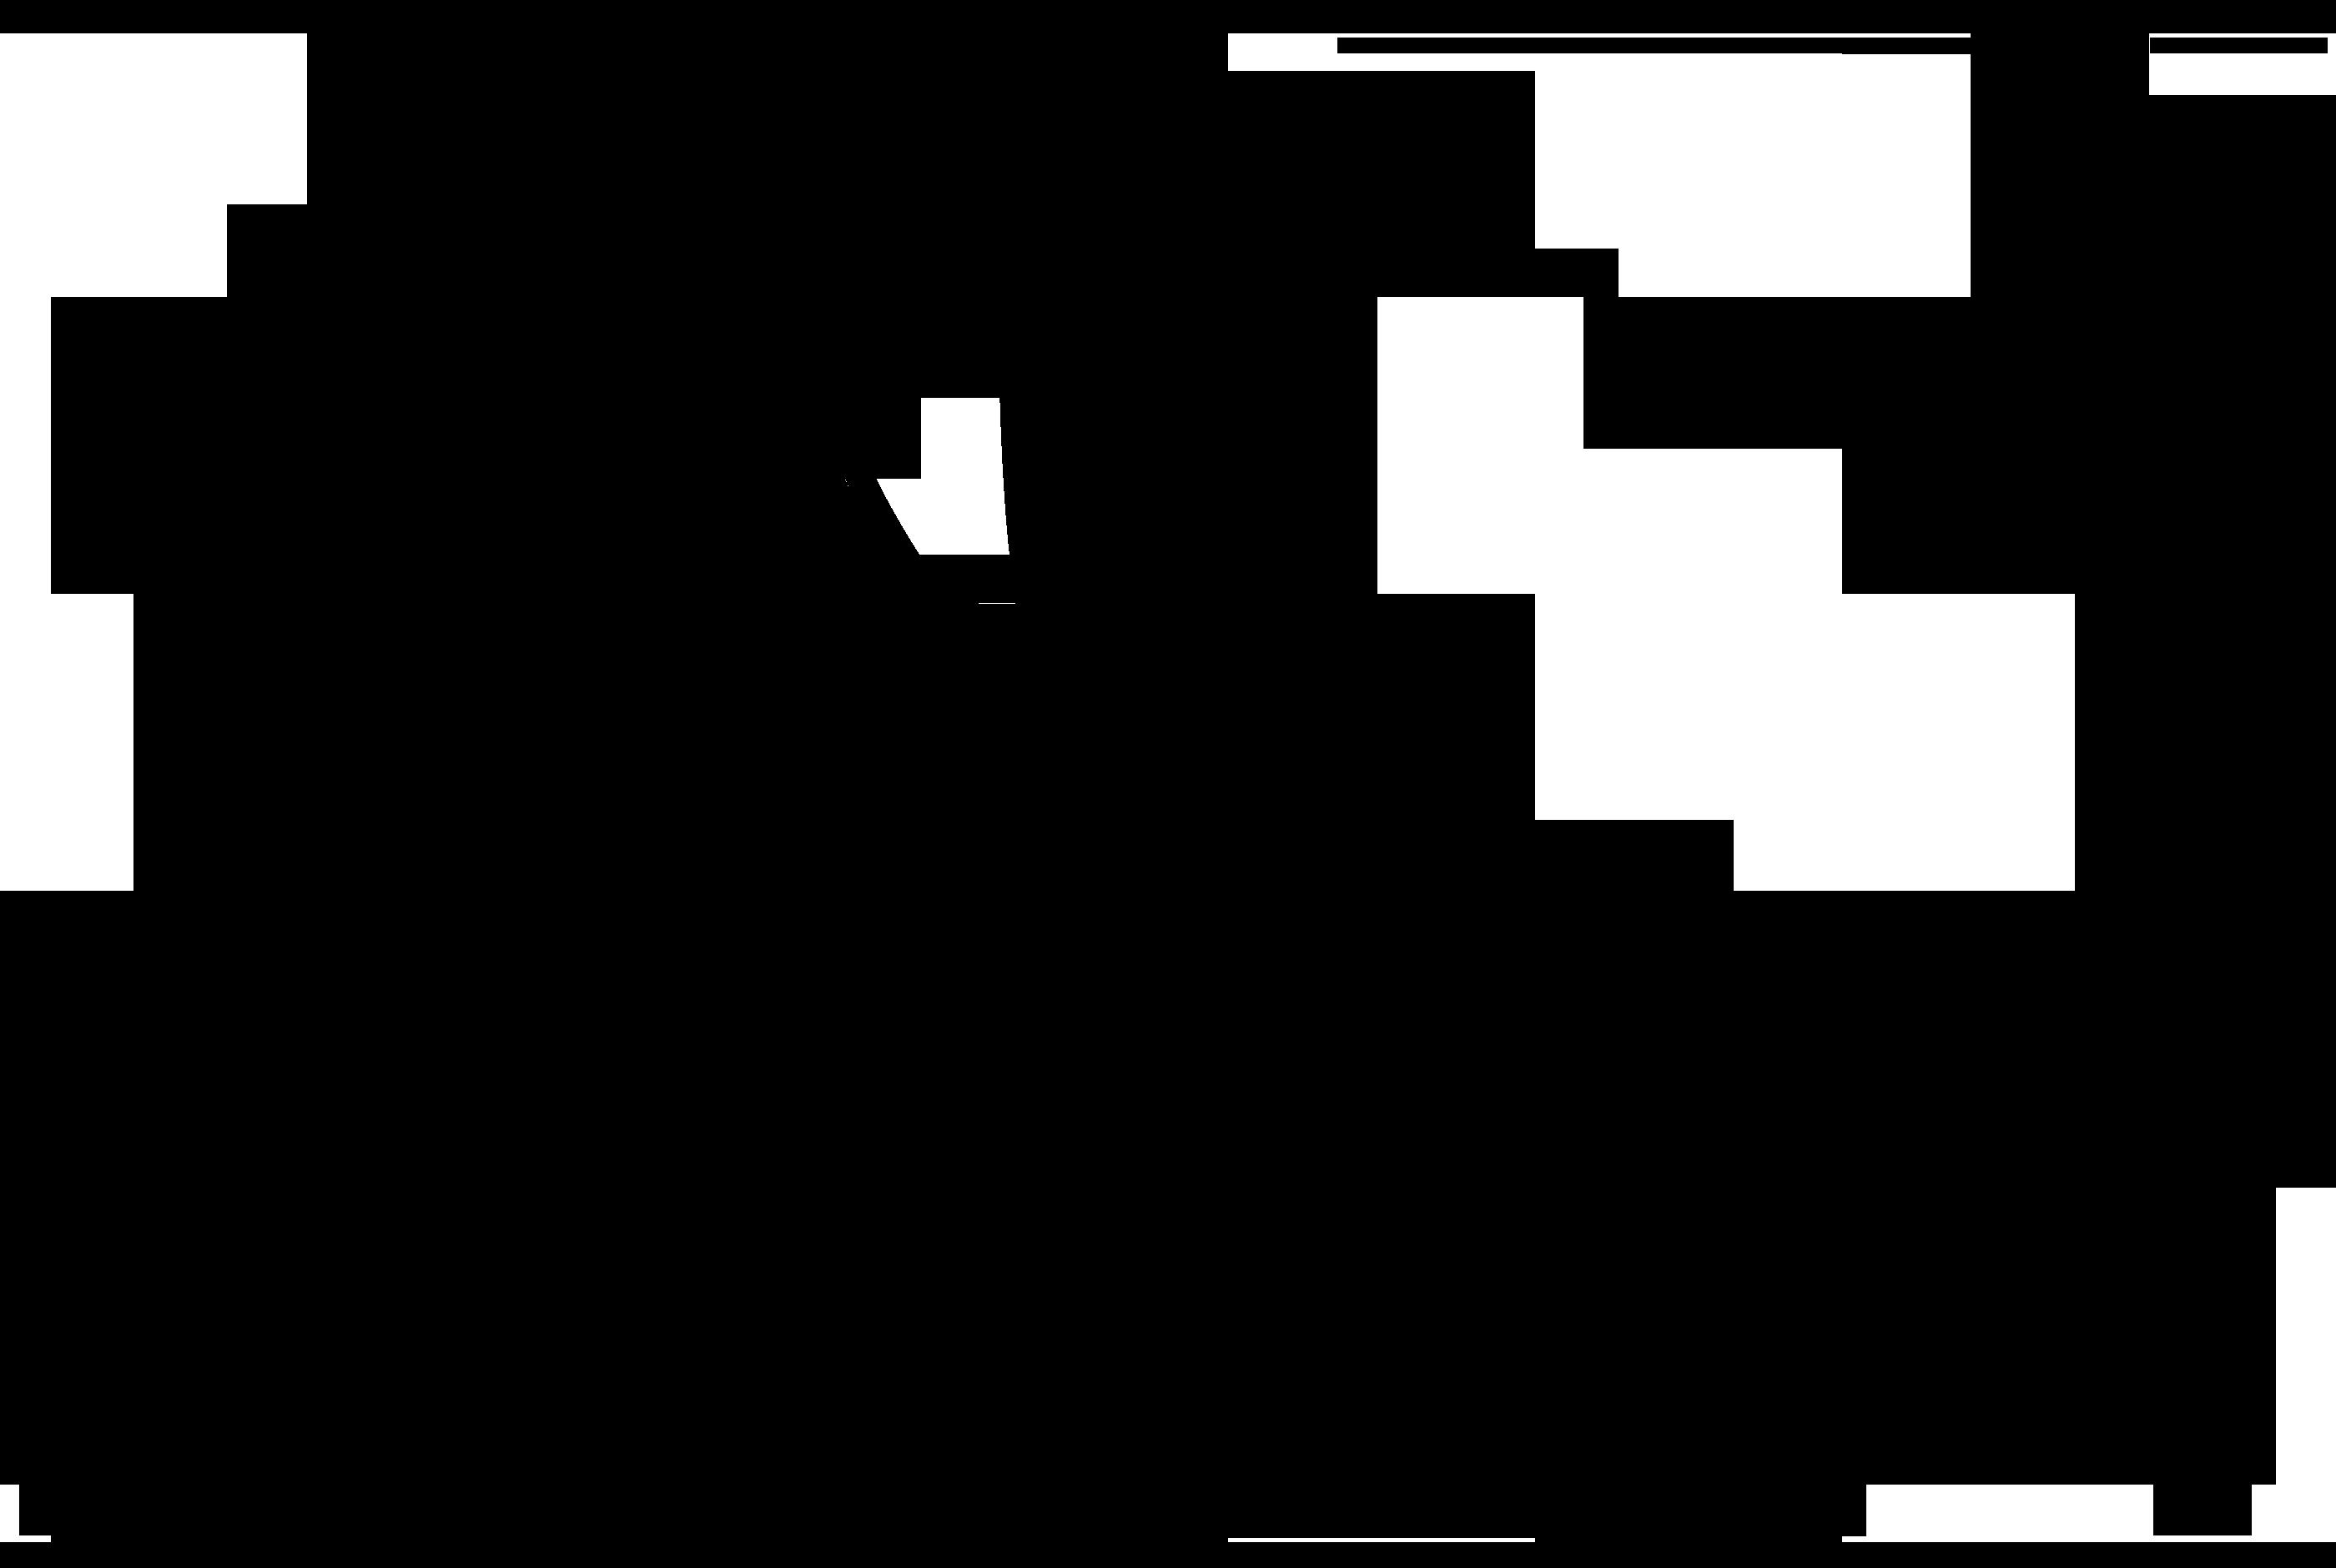 Bleach 562 - Renji scene - Lineart by DEOHVI